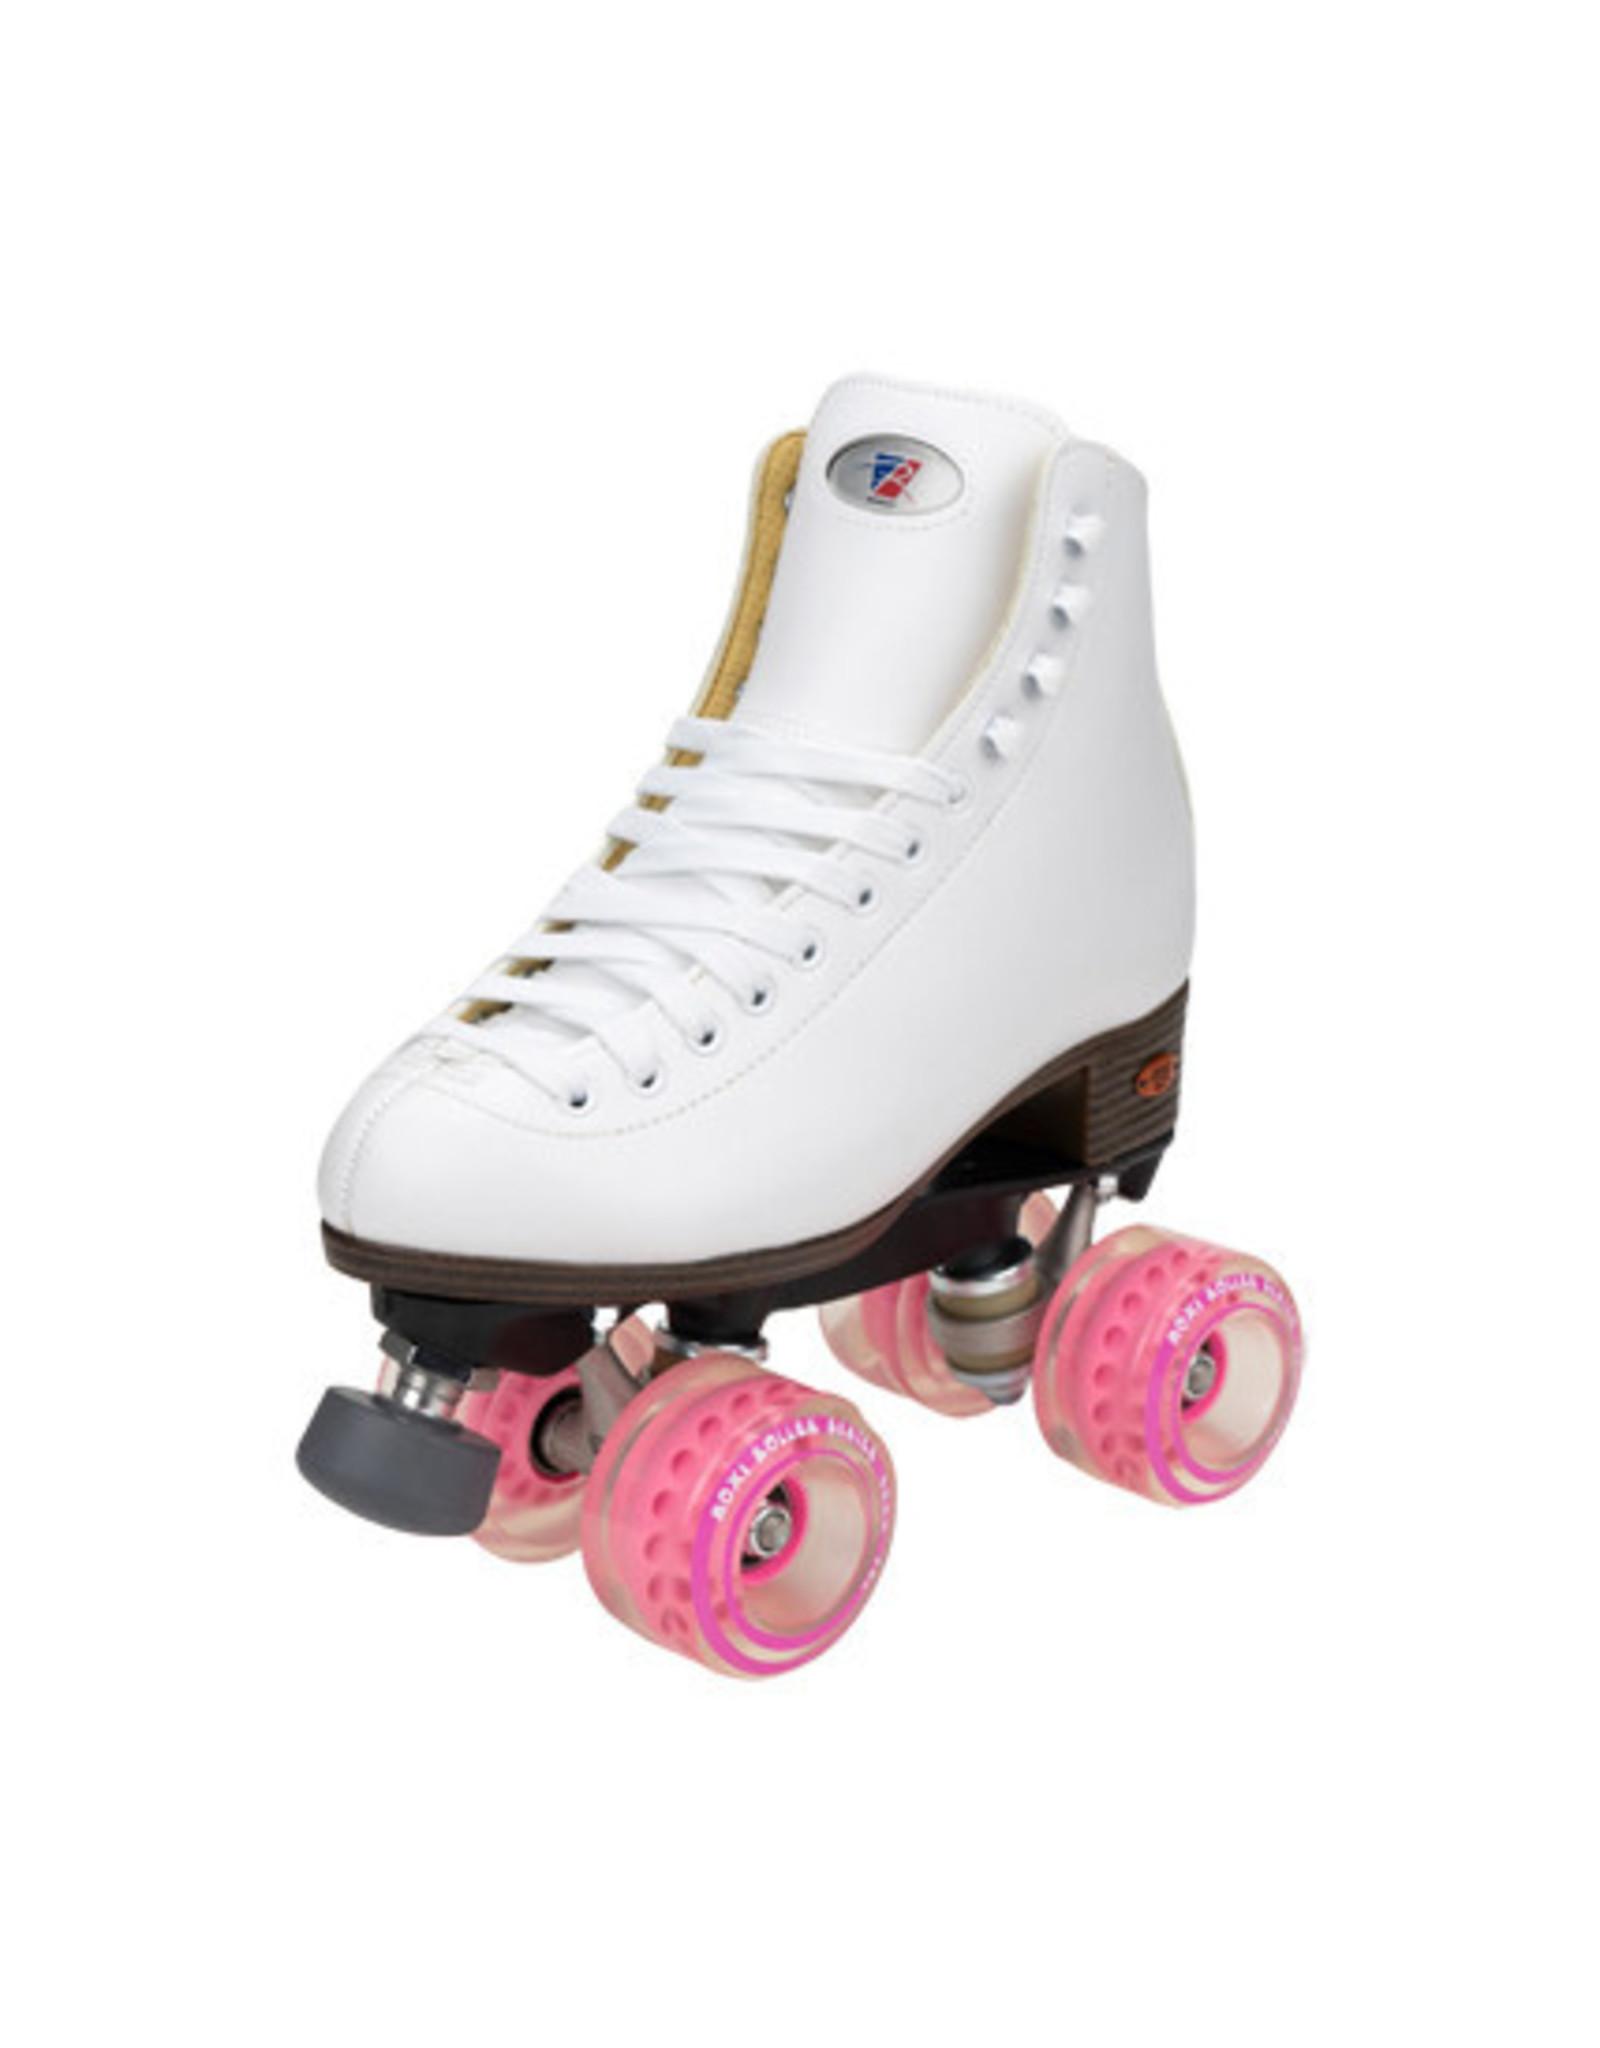 Moxi Skates Moxi JoyRide